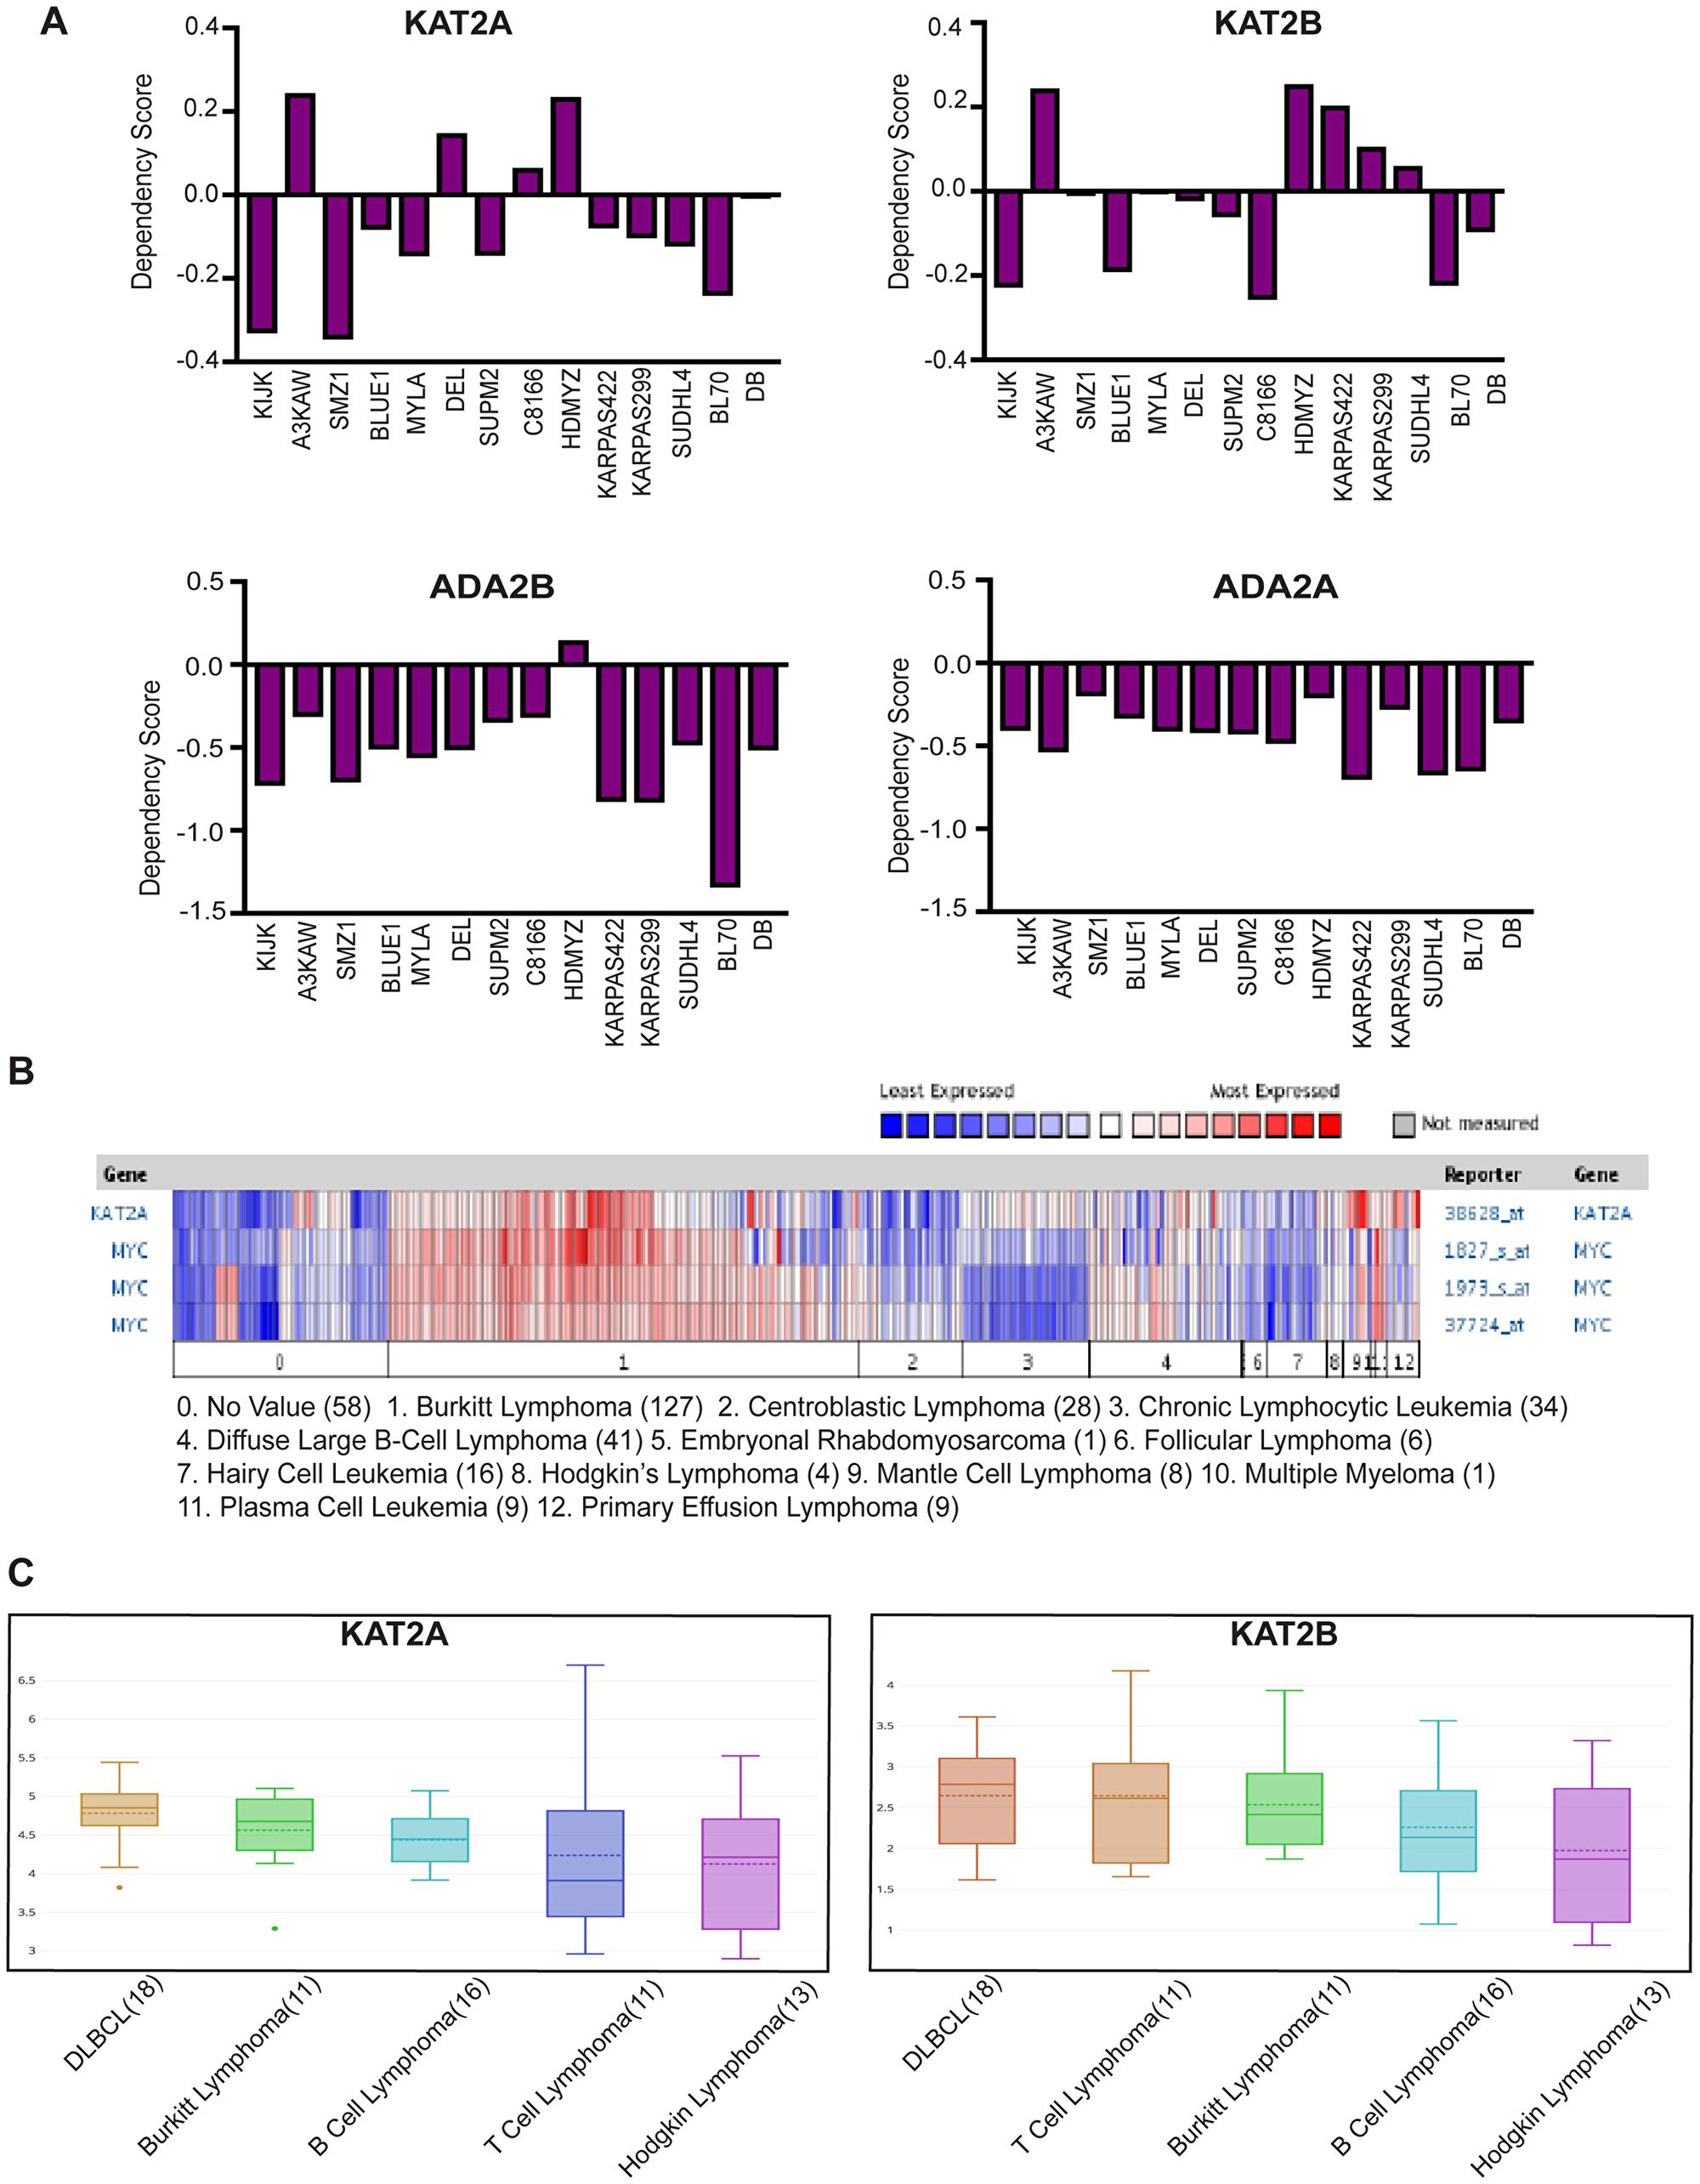 GCN5 and SAGA is implicated in human Burkitt Lymphoma.